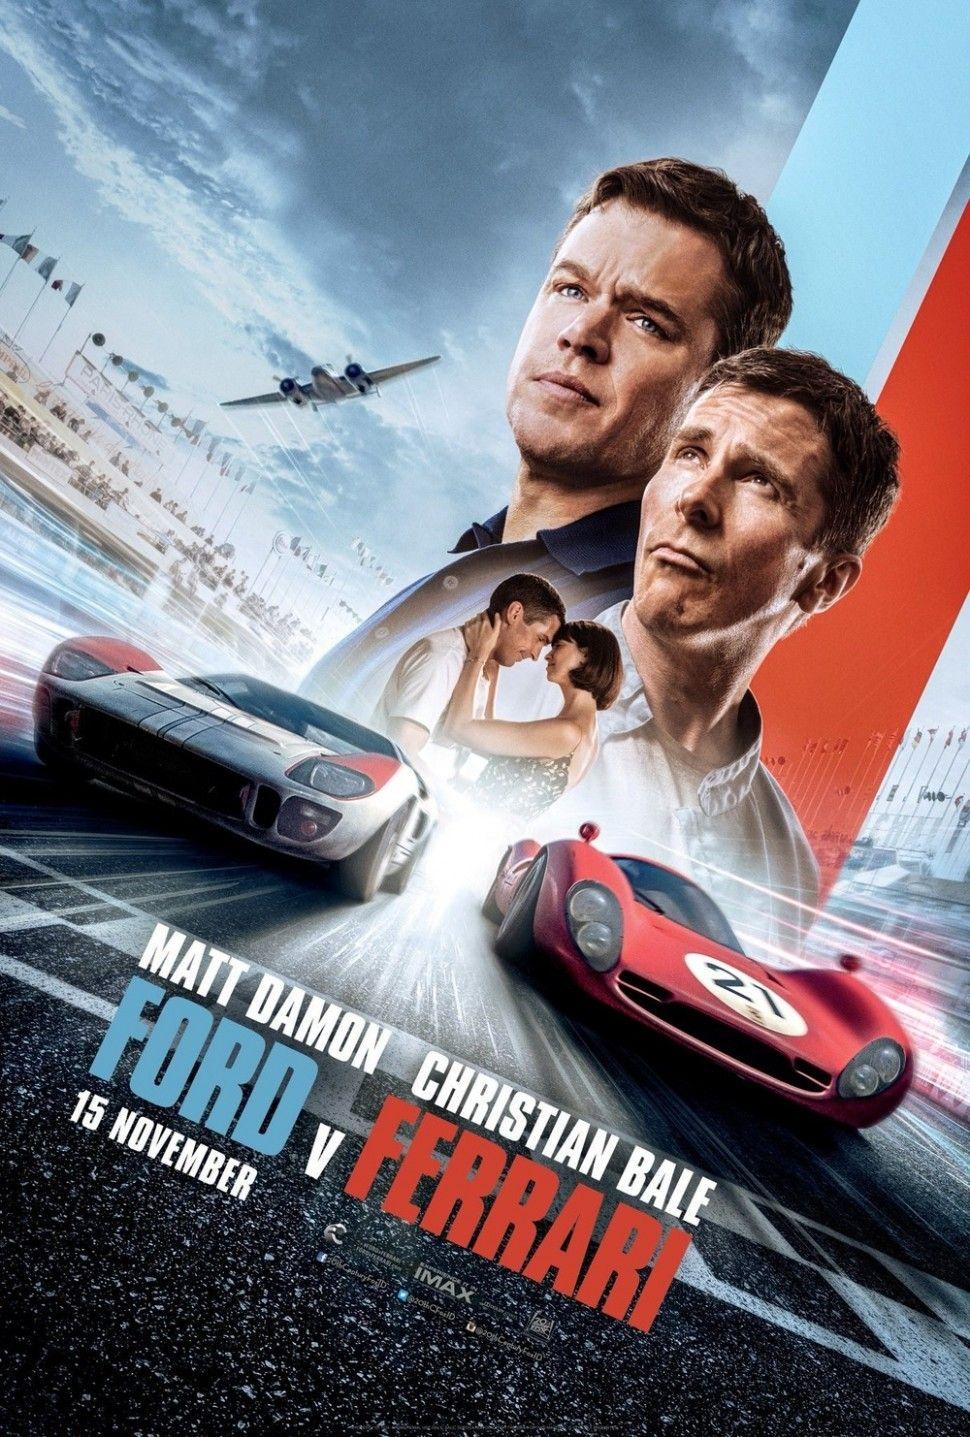 Ford Vs Ferrari Trailer 2020 Exterior Ford Vs Ferrari Trailer 2020 Most Of The Time Trailers Mislead The Admirers A Christian Bale Matt Damon Ferrari Poster